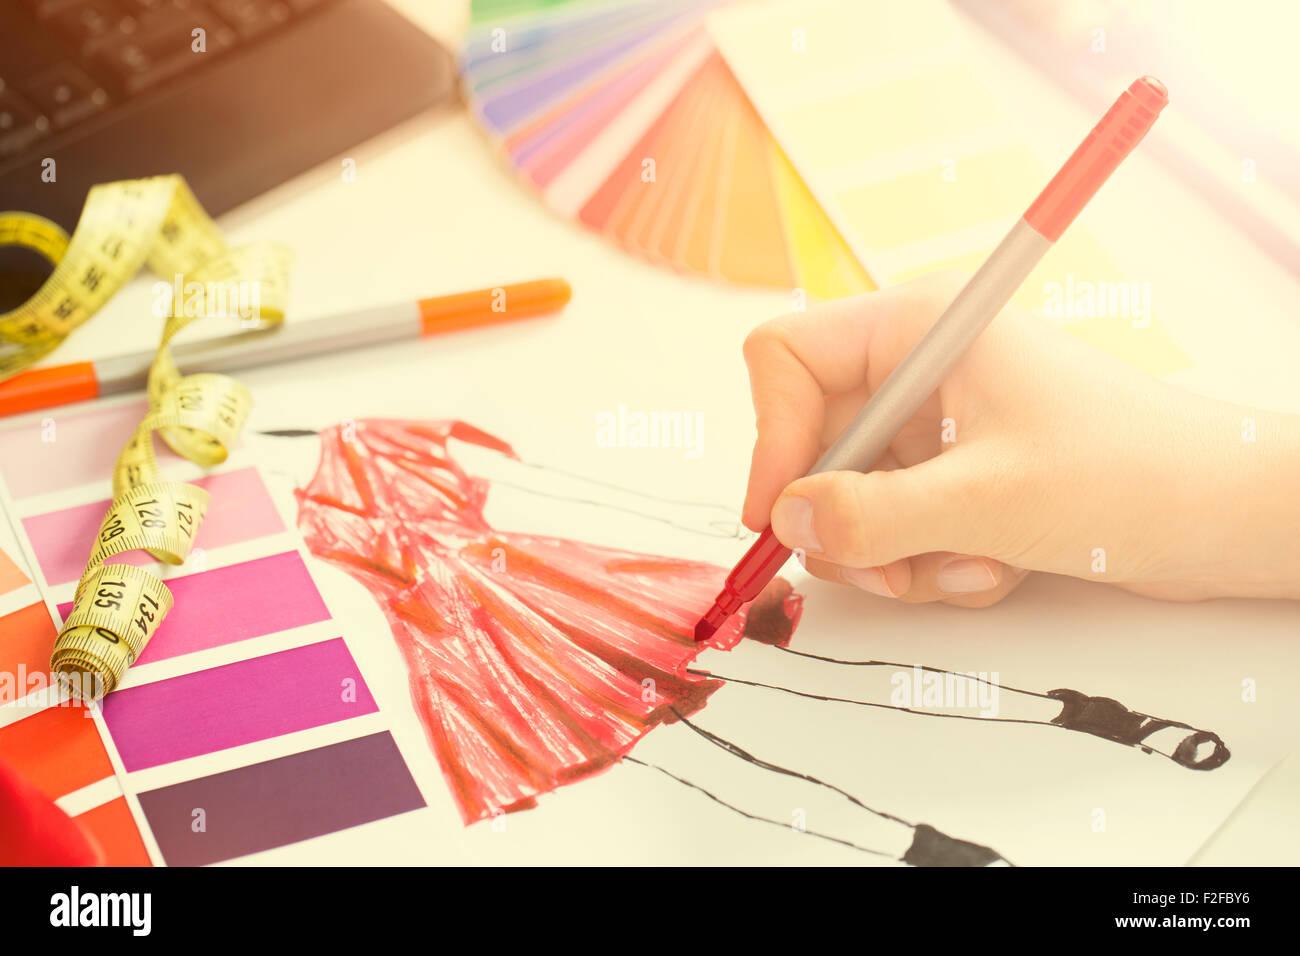 Fashion designer working in studio. Close up design. - Stock Image